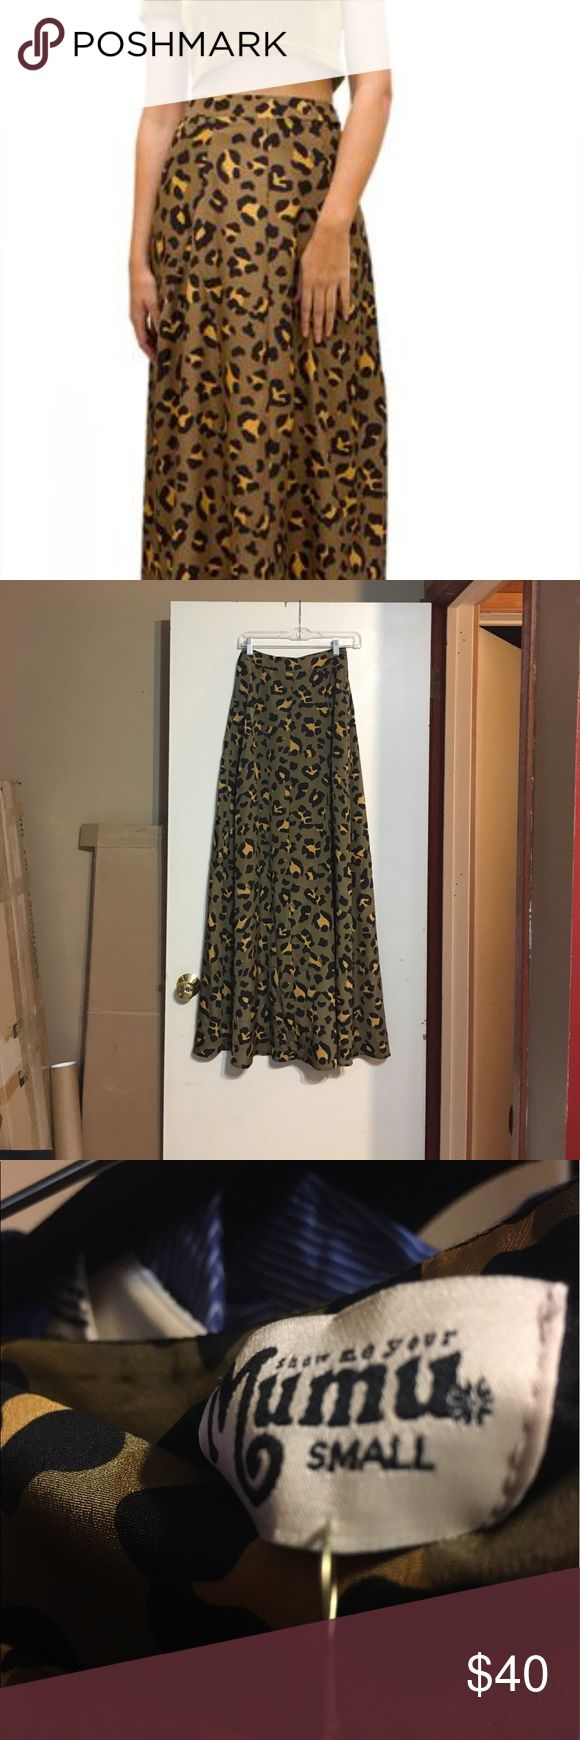 "Show Me Your Mumu leopard maxi skirt, size Small Show Me Your Mumu Princess Di ball gown skirt in Golden Grahams (leopard print). 13"" waist (measured flat), 45"" long, side zipper, short black slip underneath. 100% polyester. NWT, never worn. Show Me Your MuMu Skirts Maxi"